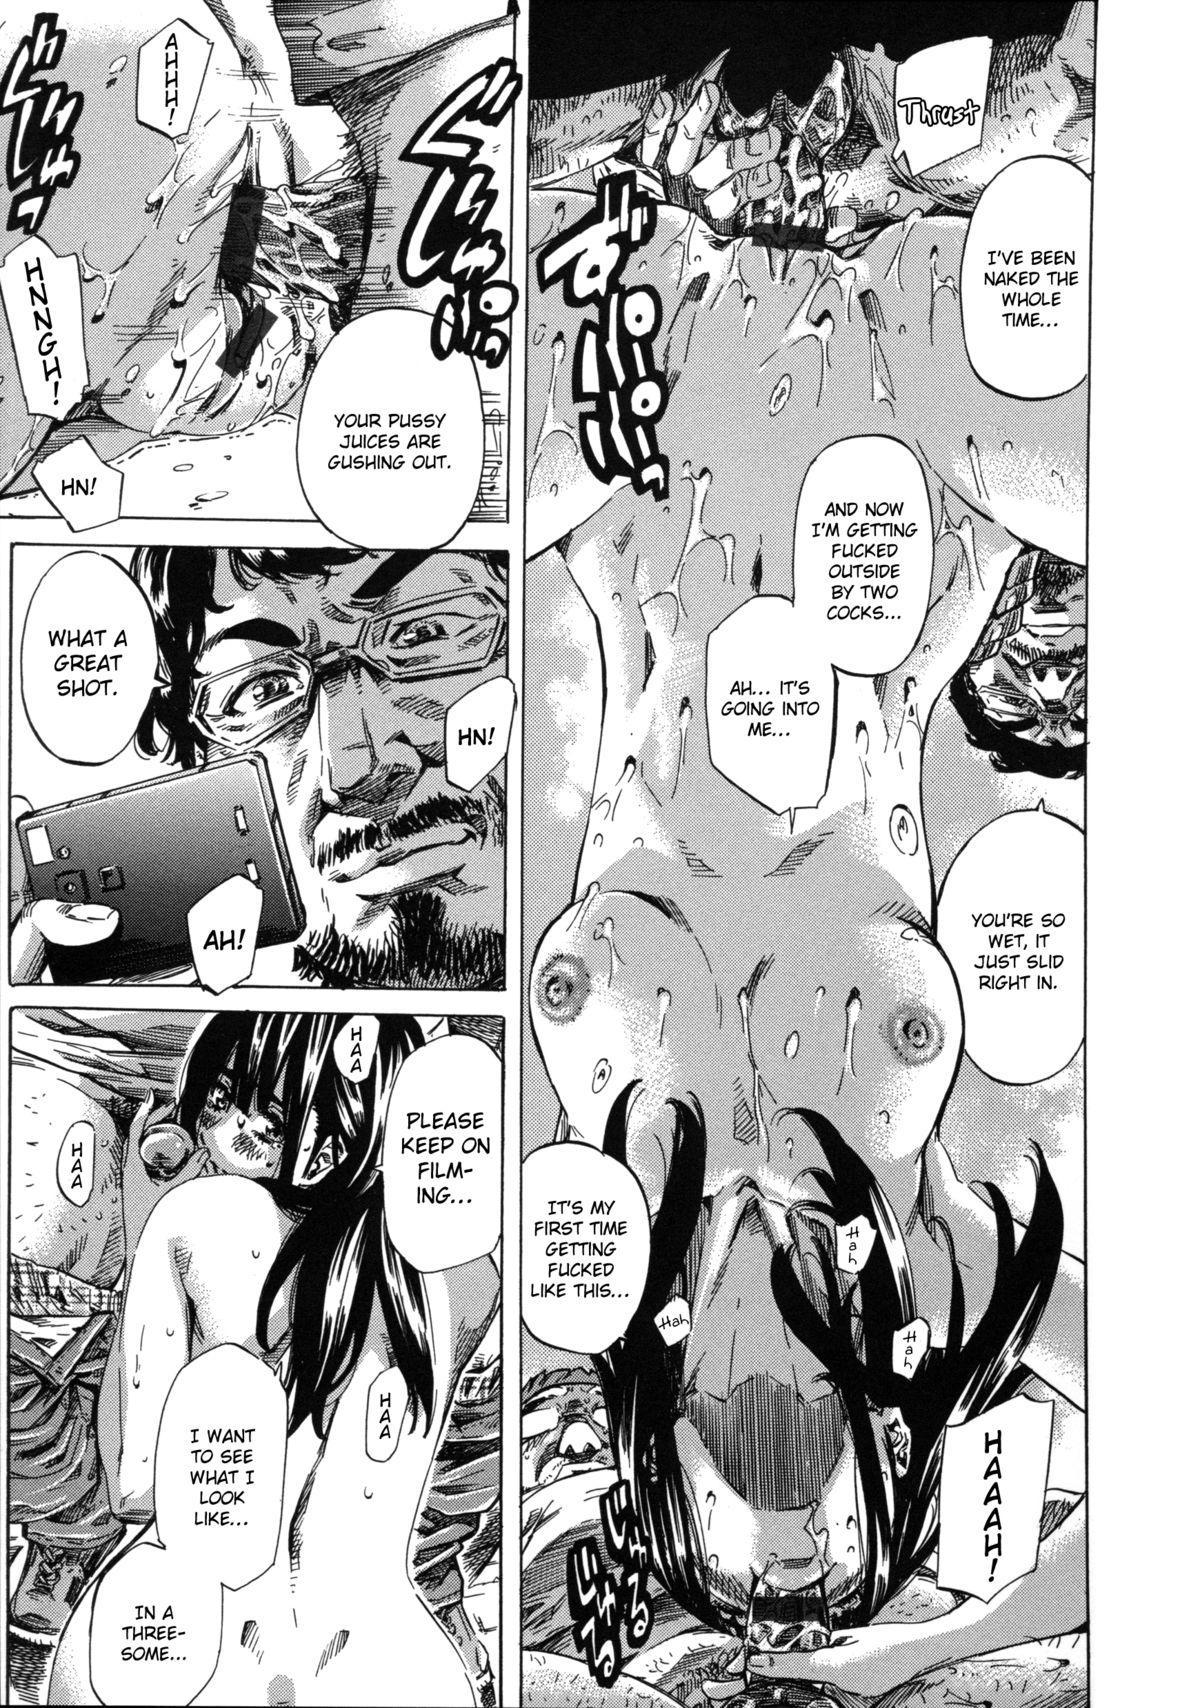 Kashiwazaki Miki wa Ironna Basho de Zenra Sanpo Shitemita | Miki Kashiwazaki Goes Naked in All Sorts of Places 165